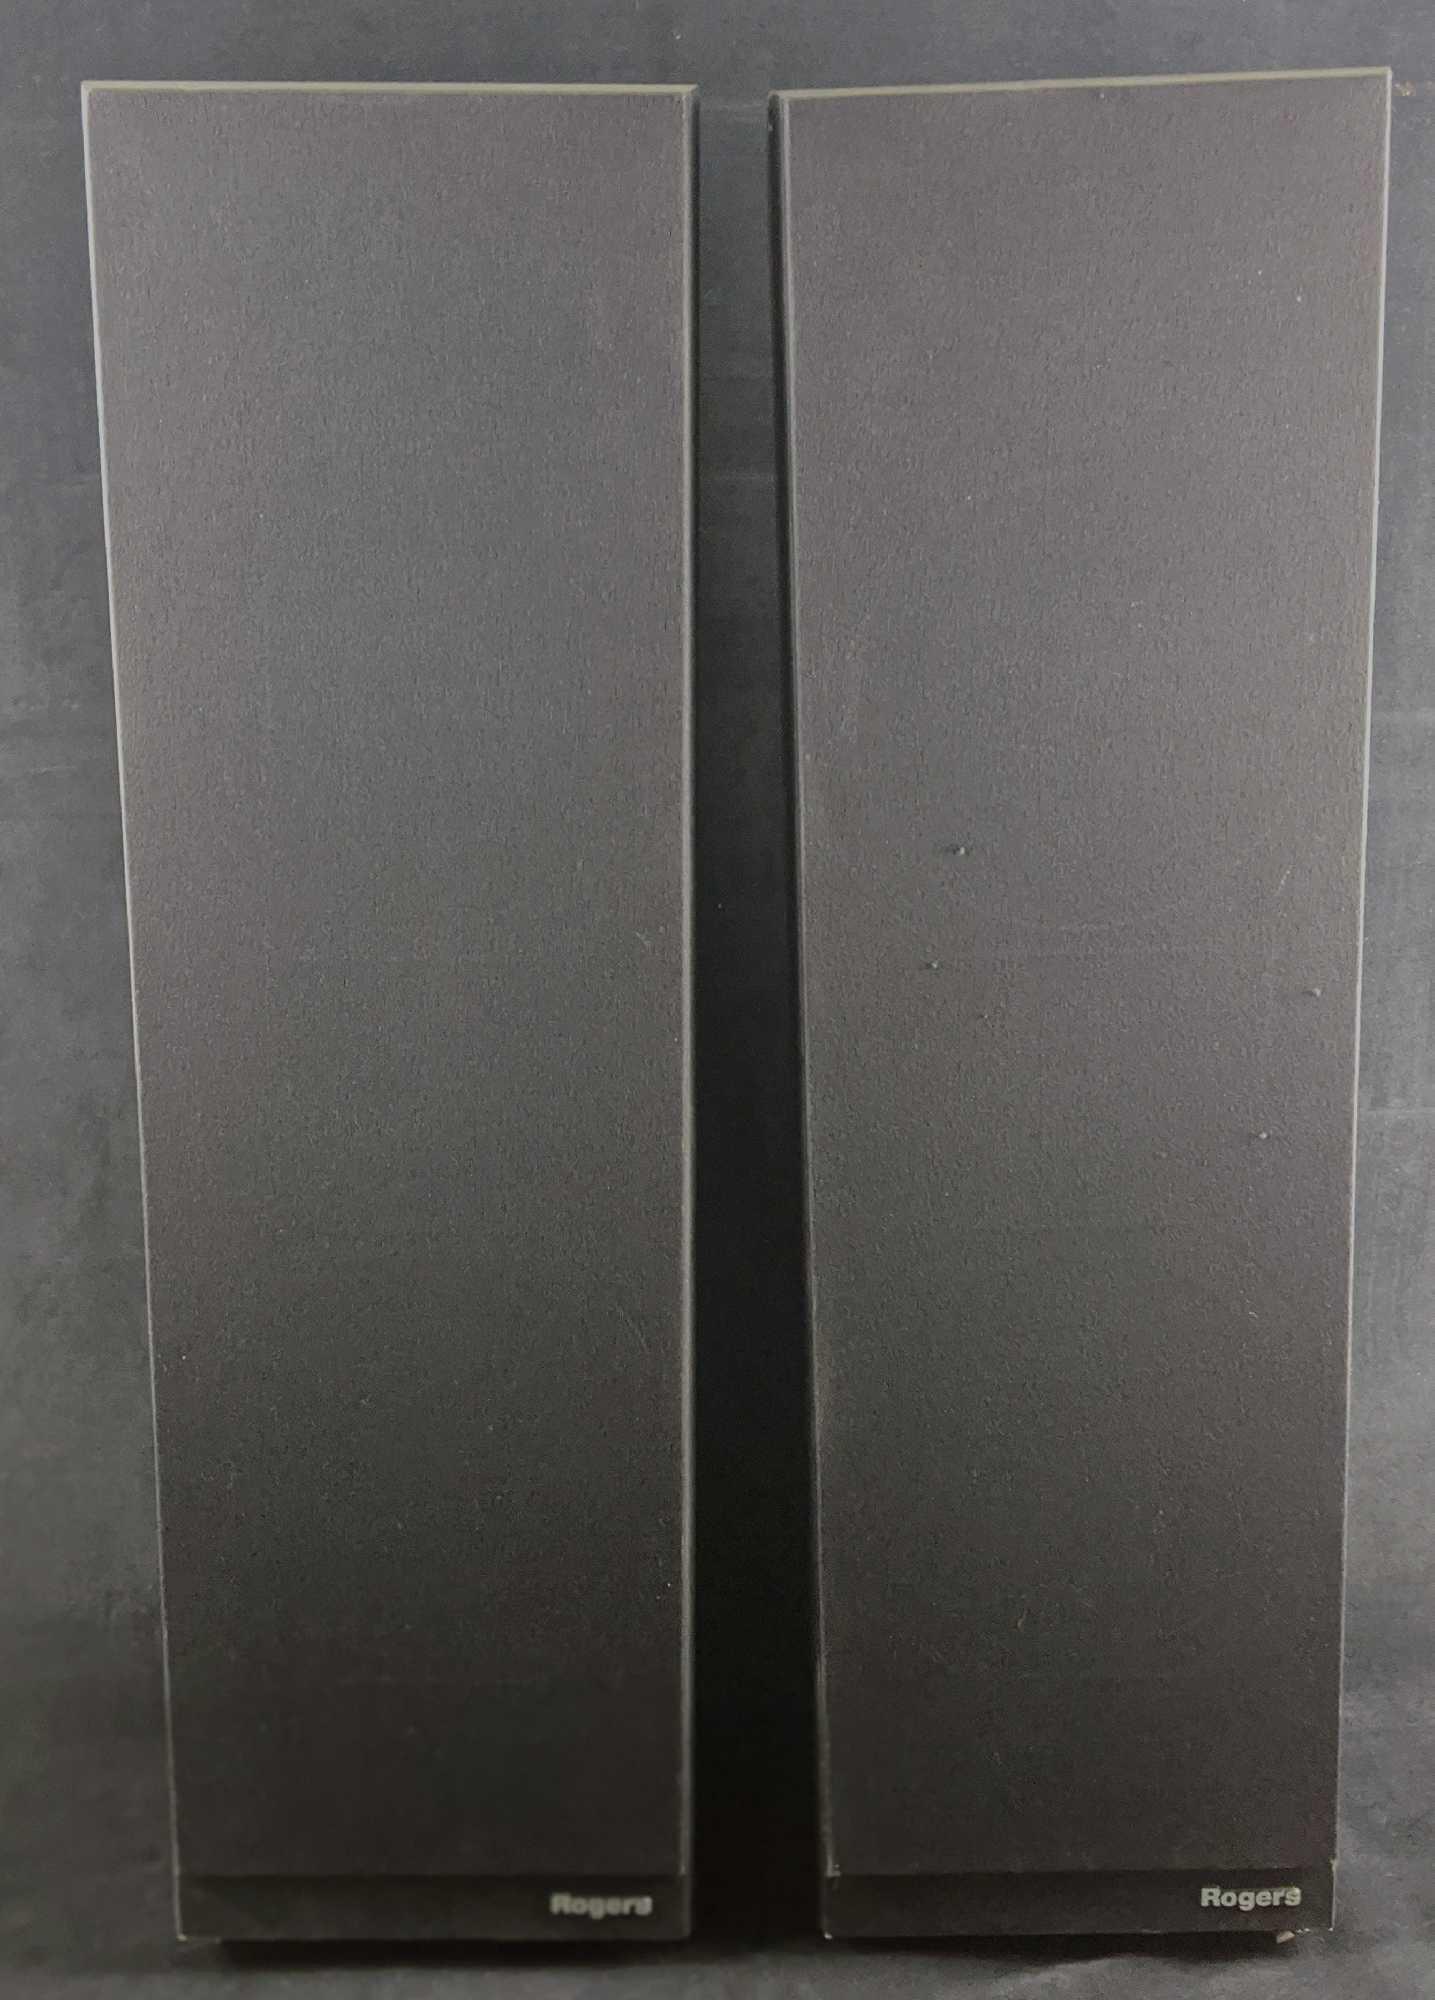 Rogers LS8a Floor Standing Speakers In Black